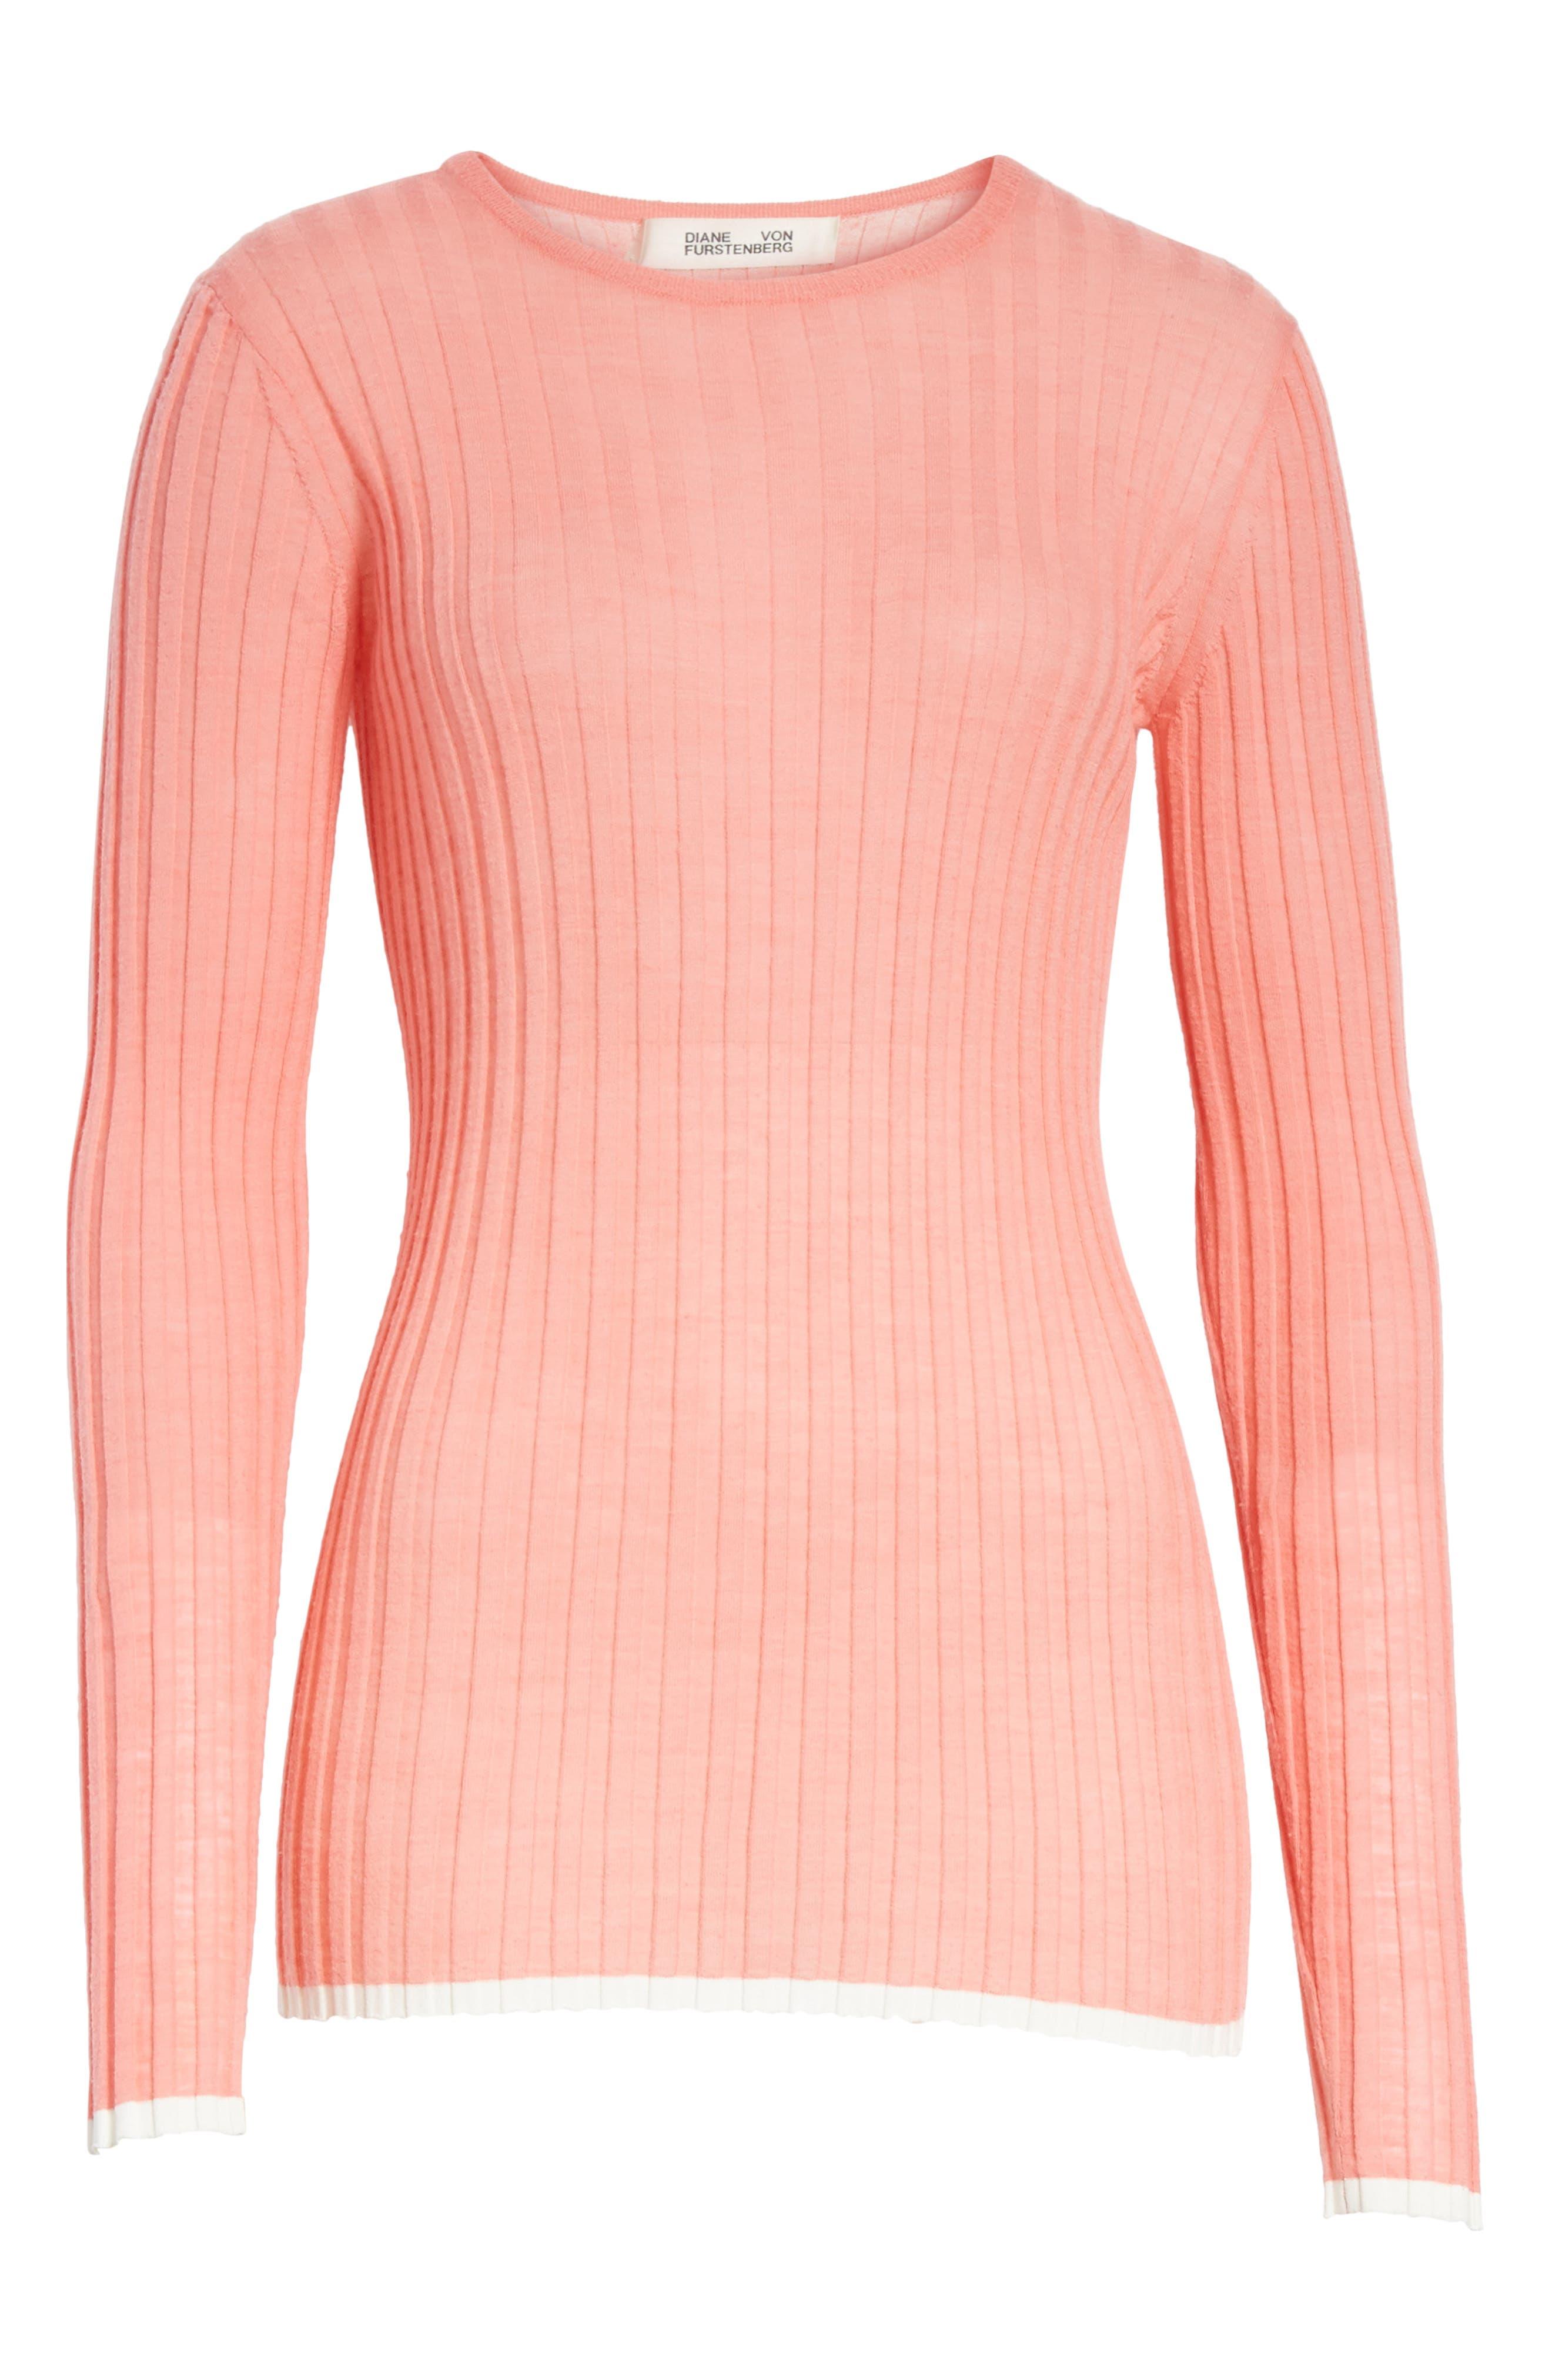 Diane von Furstenberg Ribbed Sweater,                             Alternate thumbnail 6, color,                             Hyacinth/ Ivory